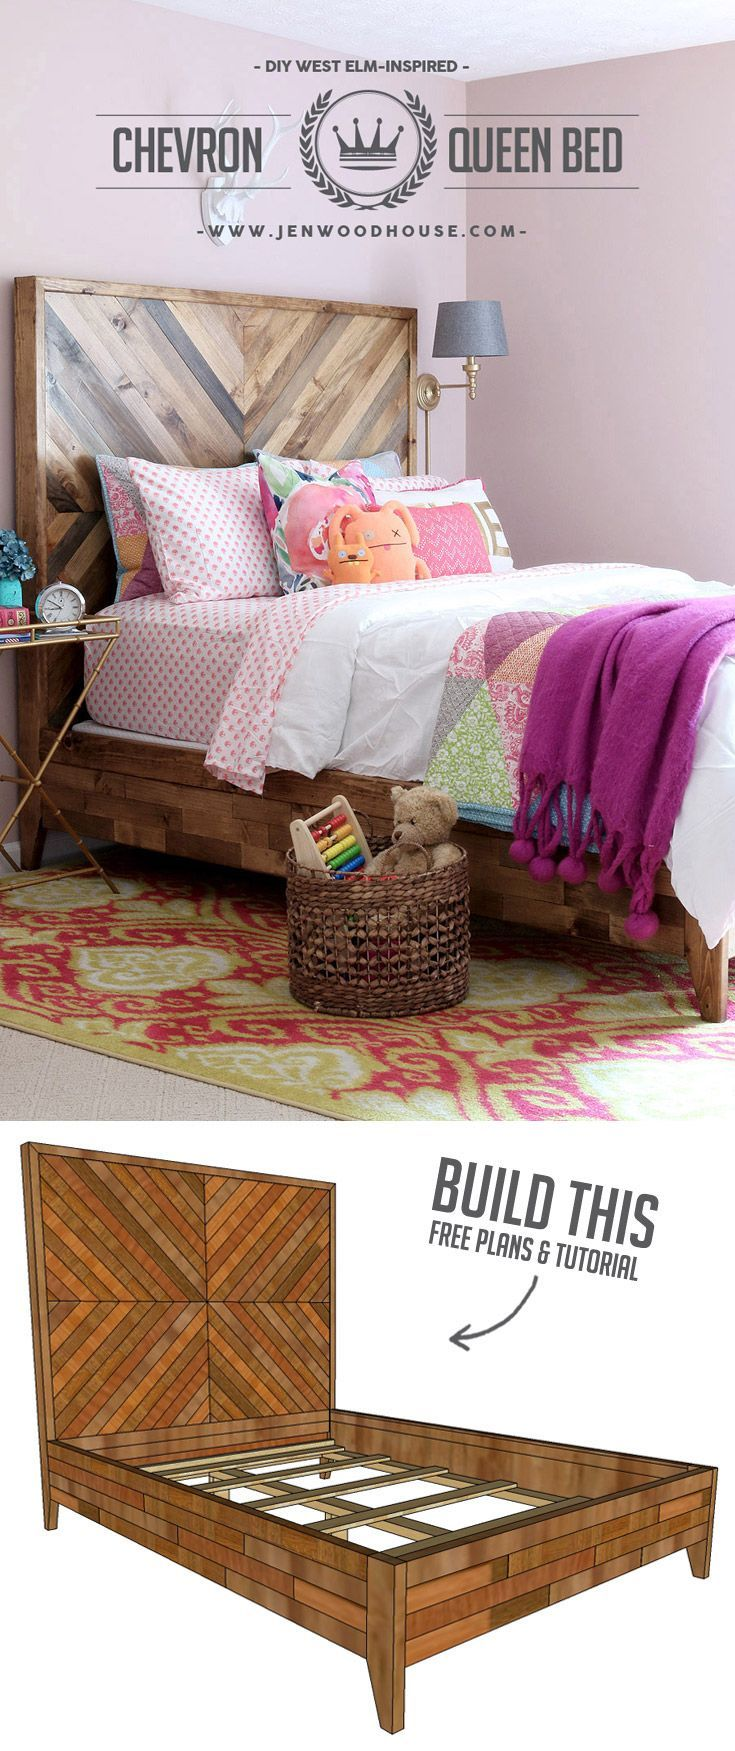 DIY West Elm Chevron Bed Free Plans Reclaimed wood